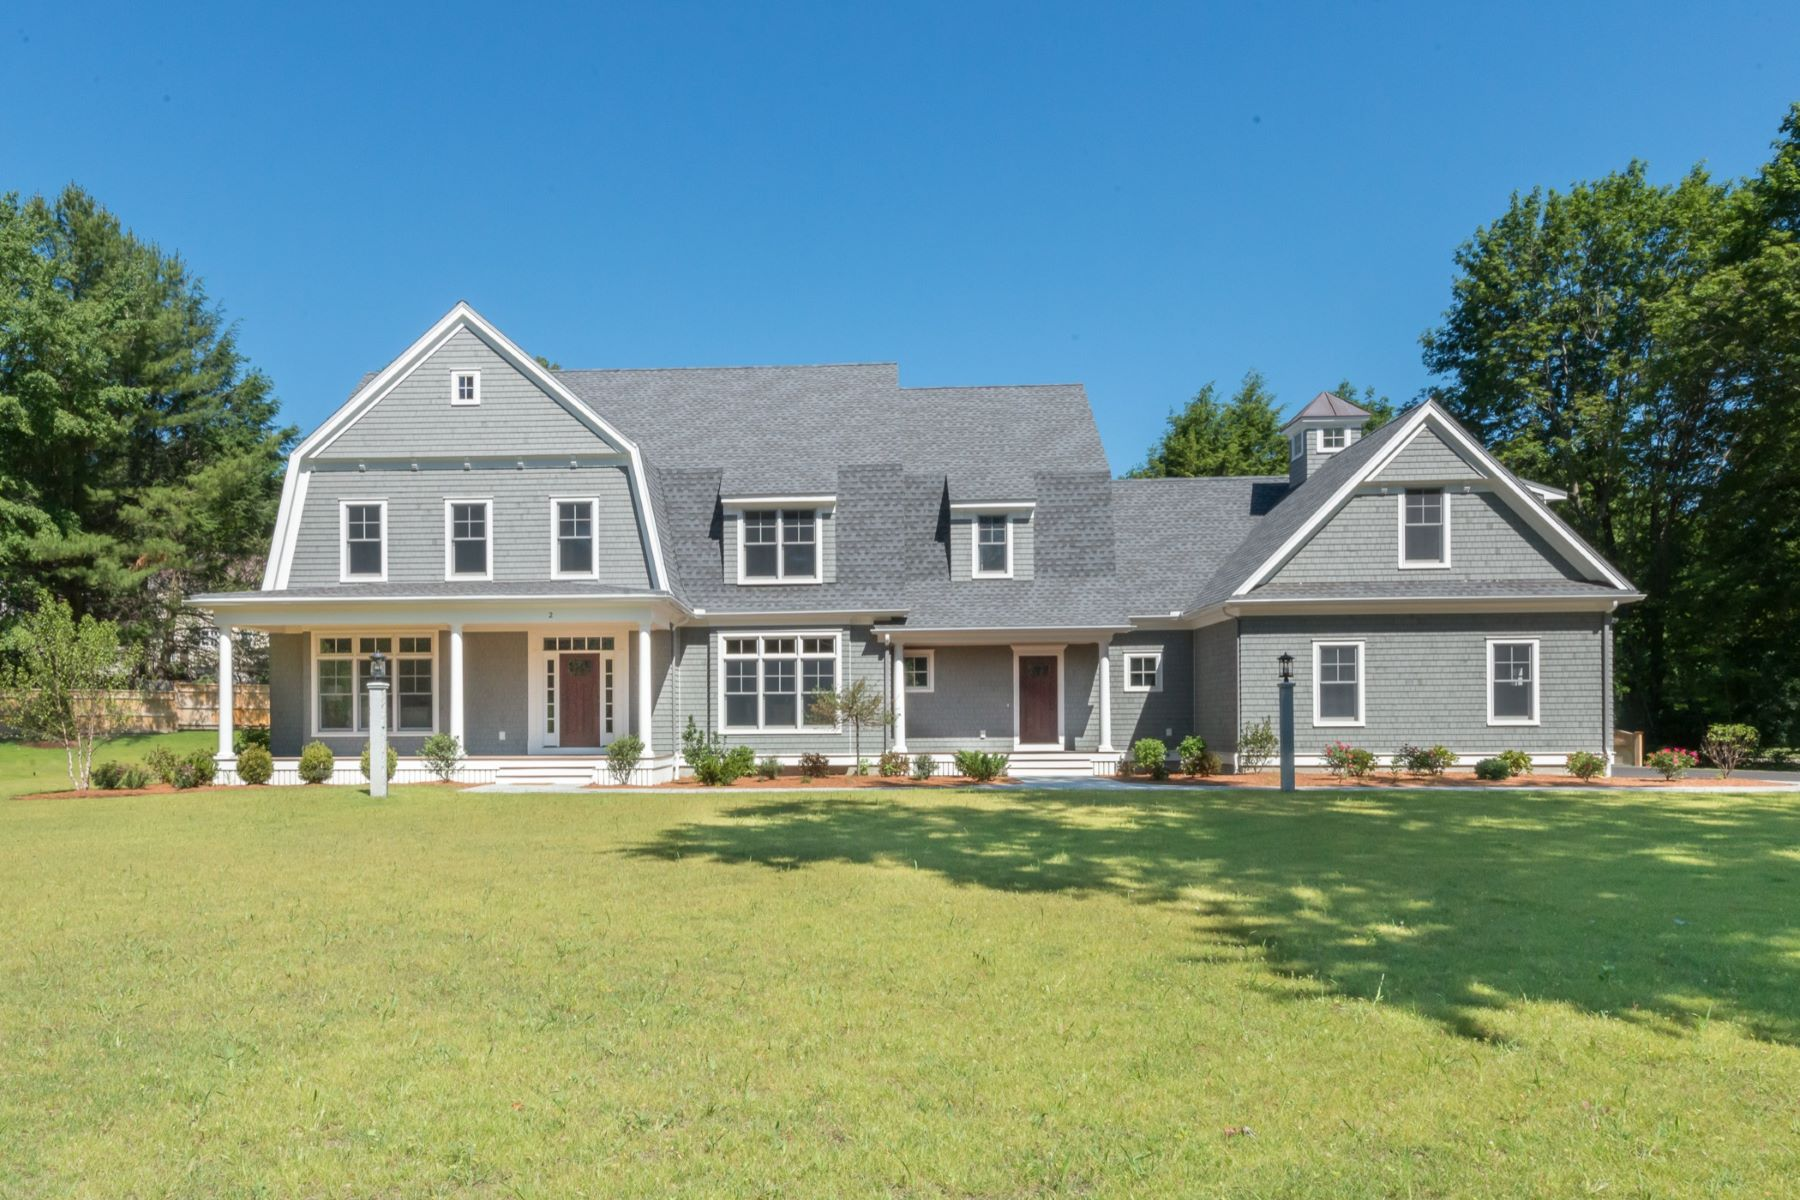 独户住宅 为 销售 在 New Nantucket-Style Shingle Home 2 Burnham Road Lexington, 02420 美国